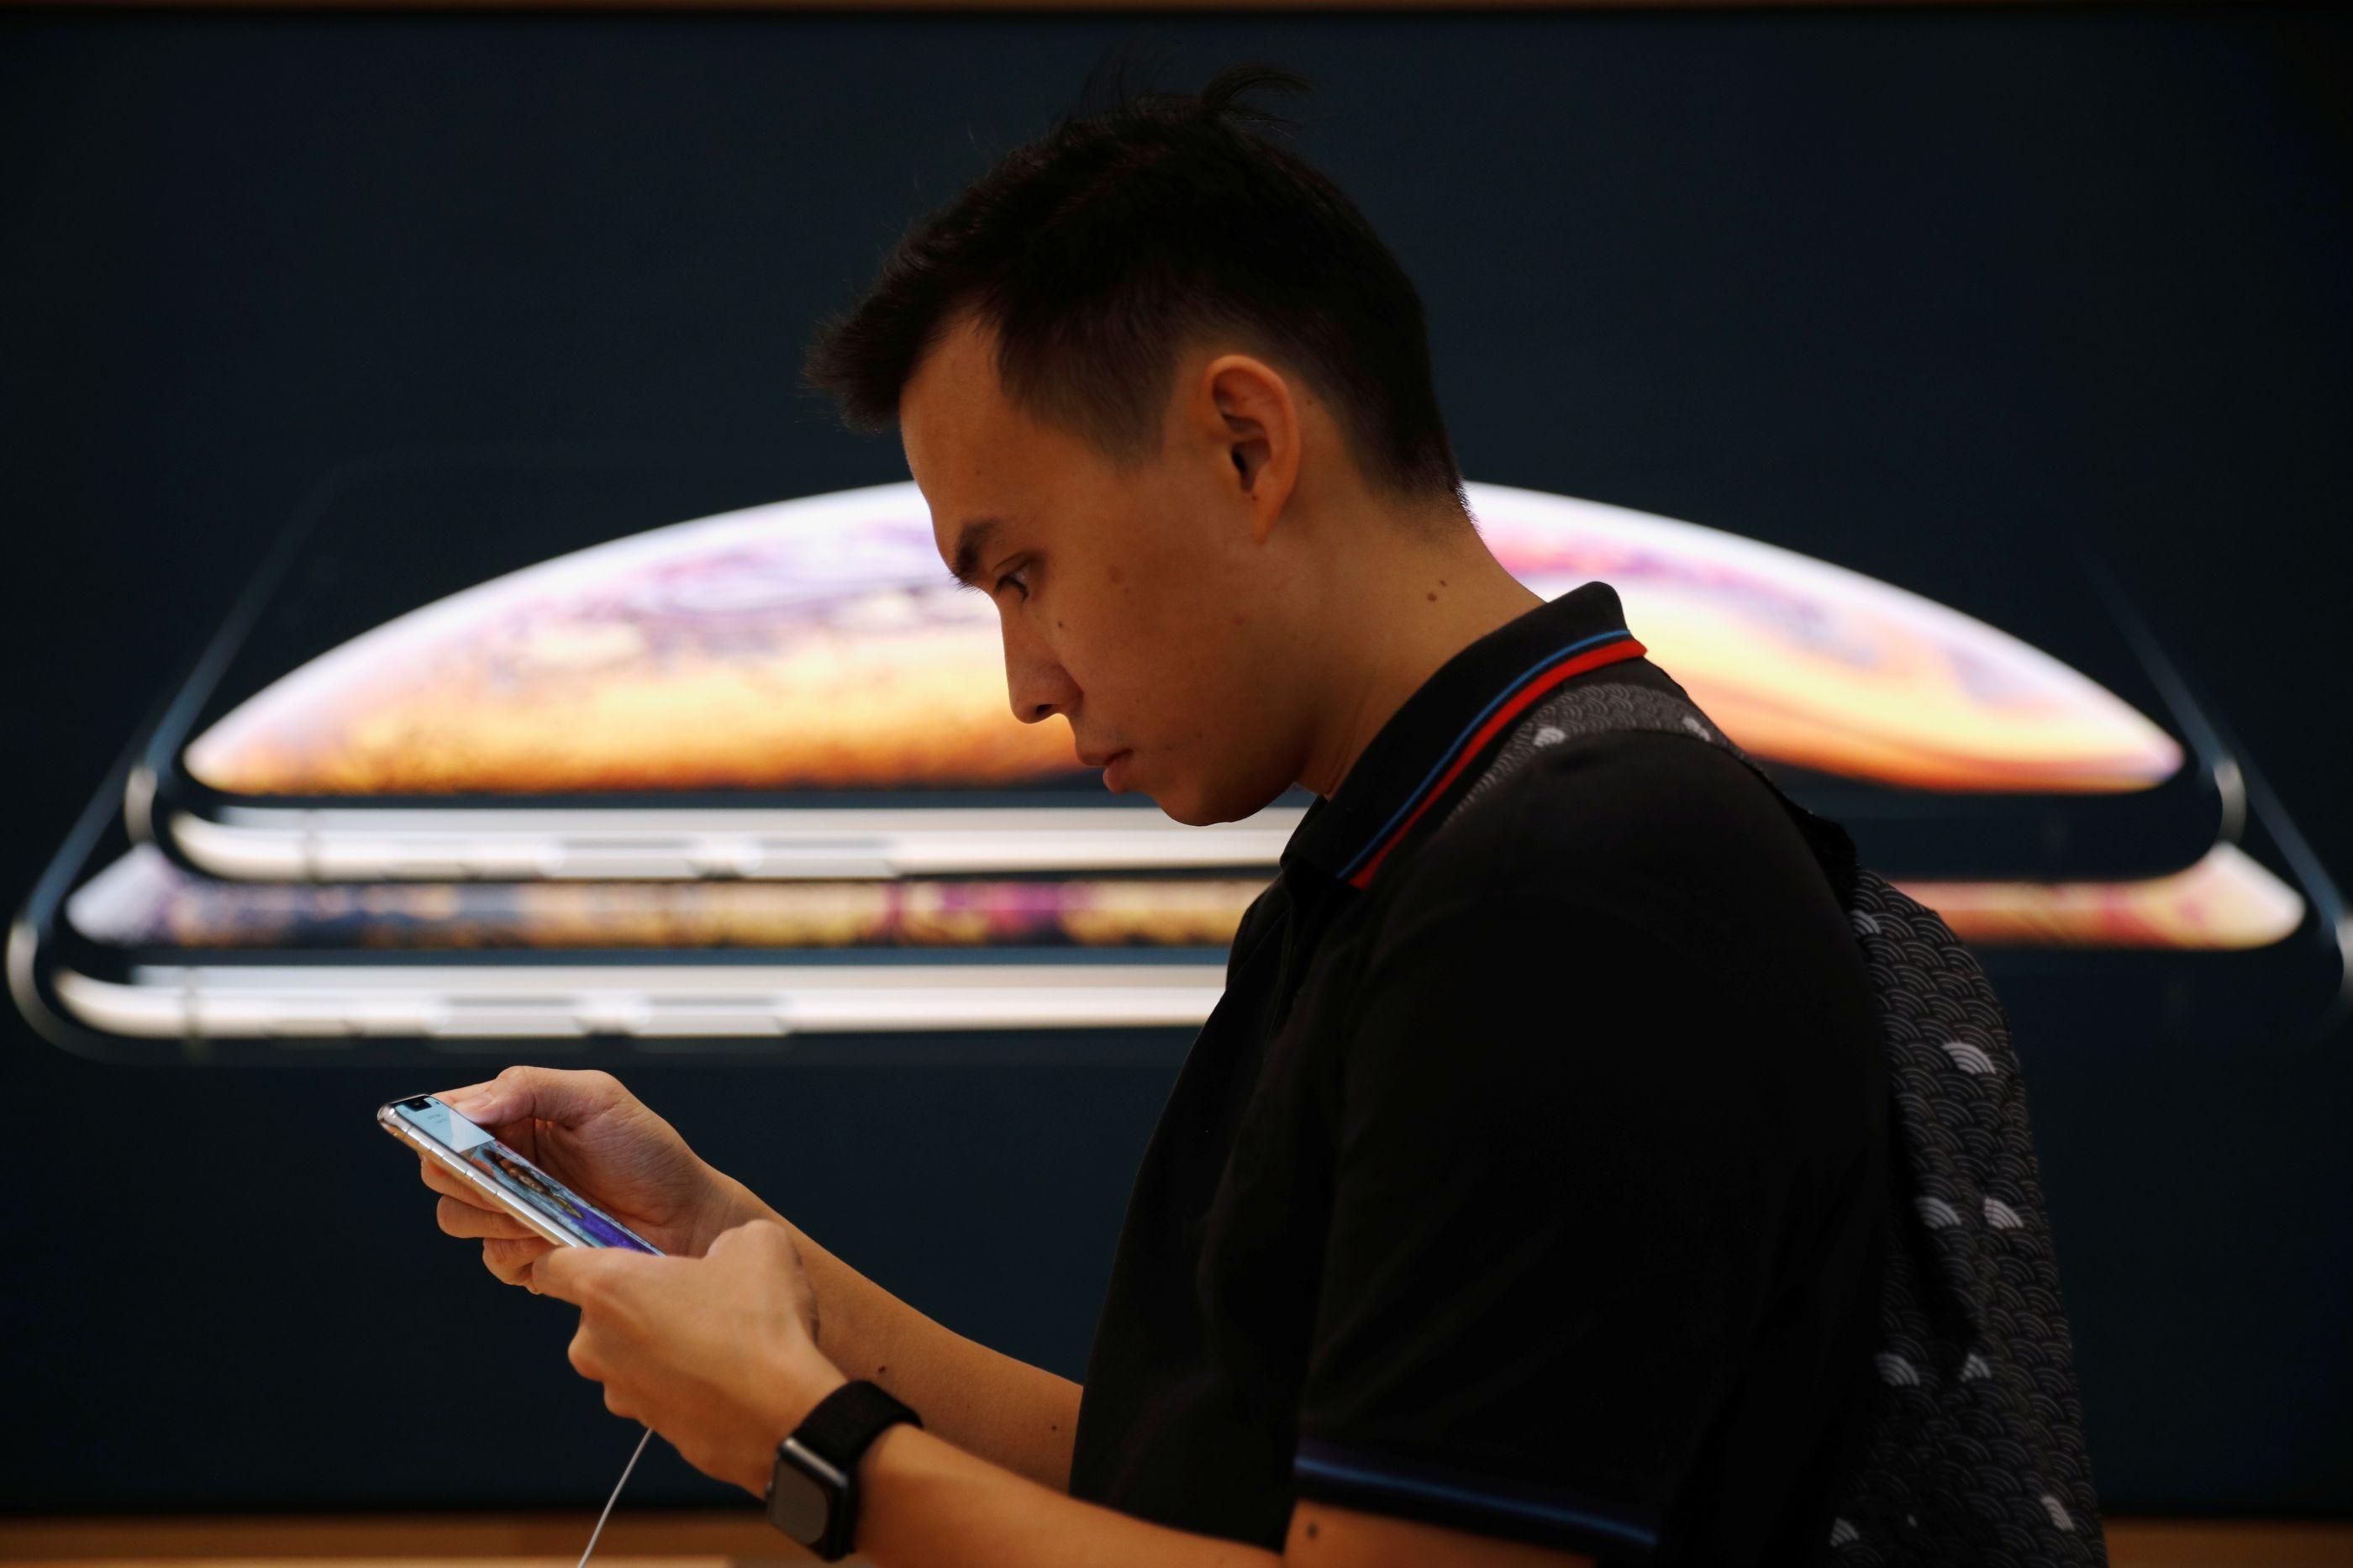 Apple ameaça eliminar apps que espiam utilizadores